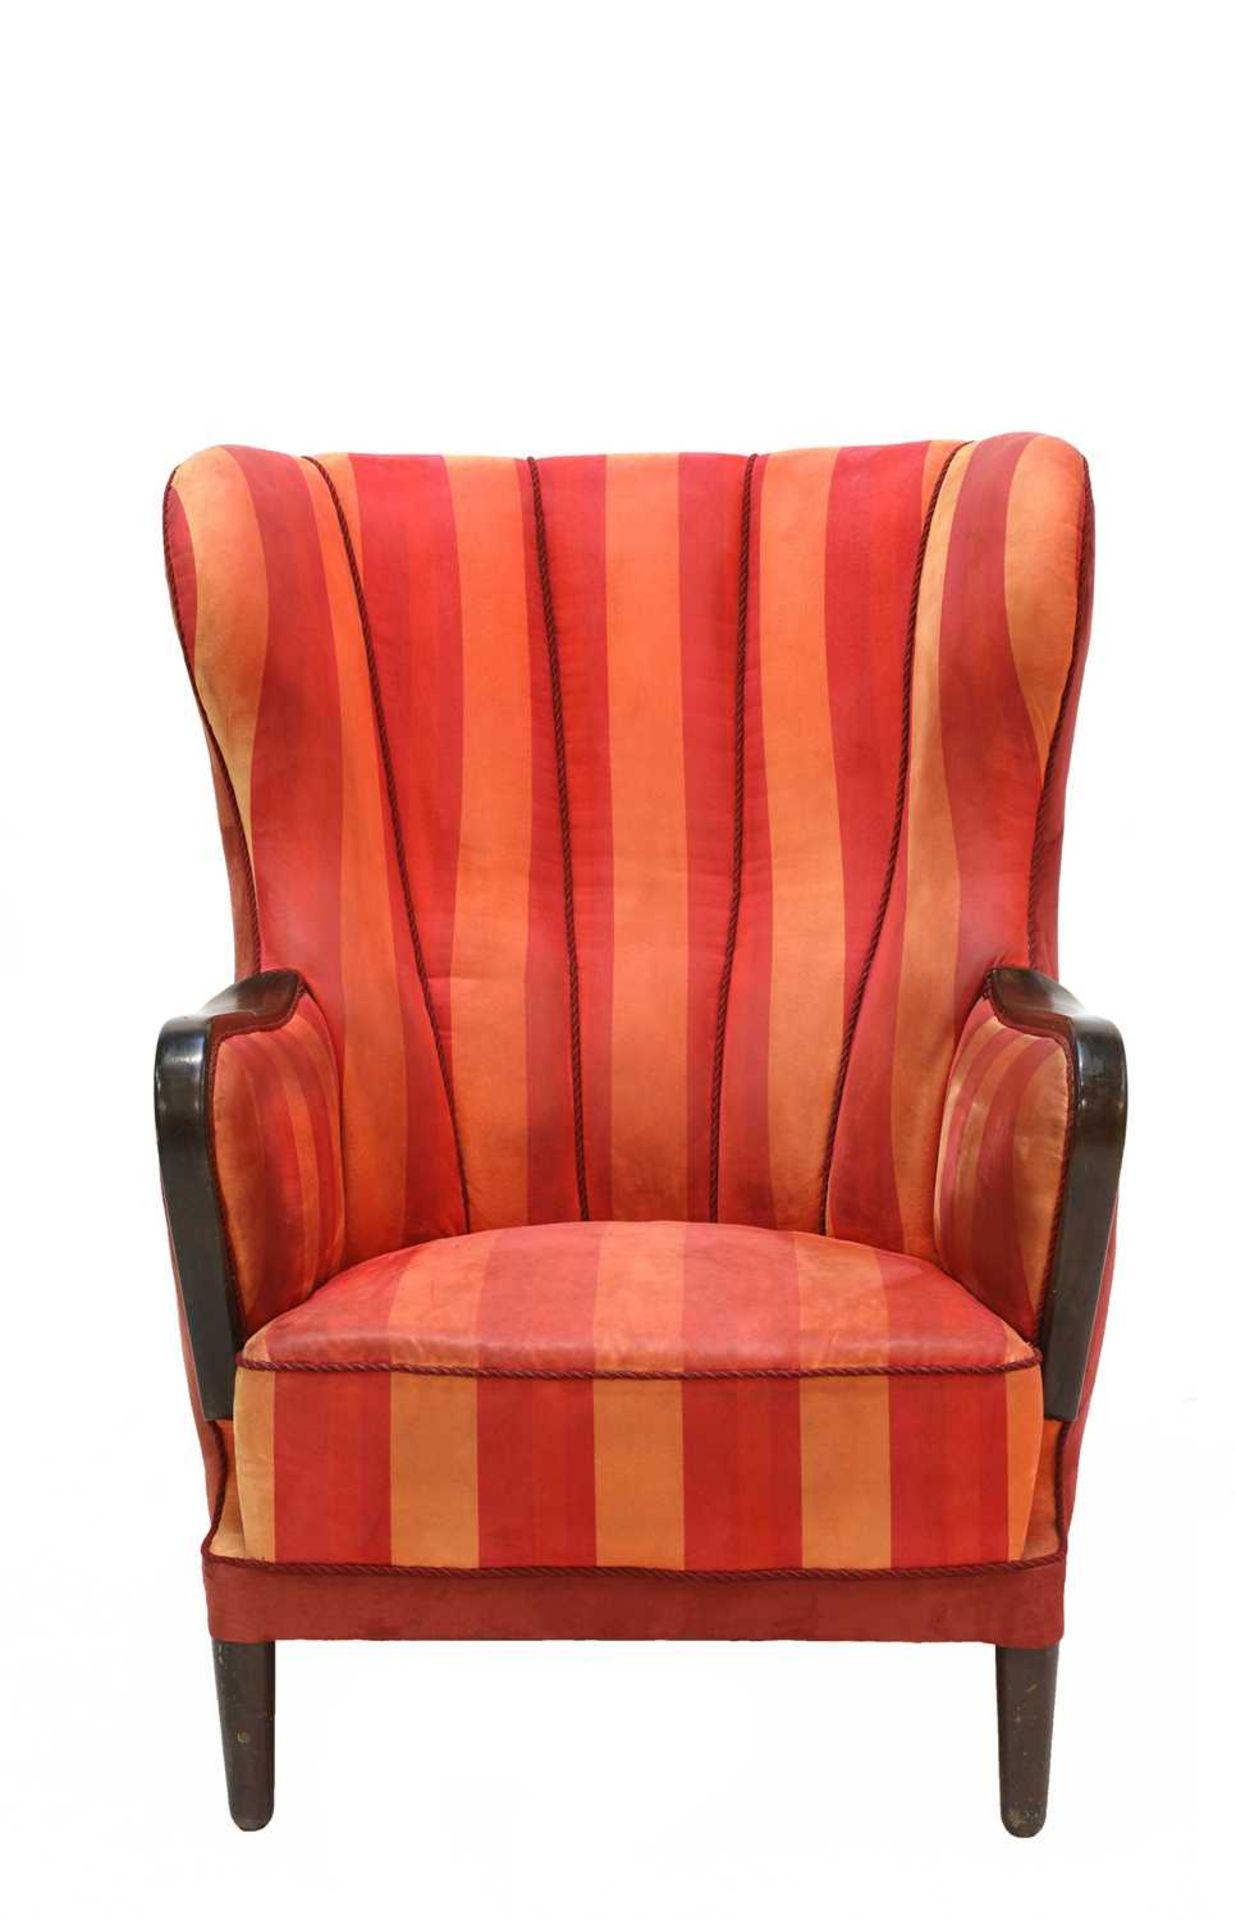 A Danish armchair, - Image 3 of 3